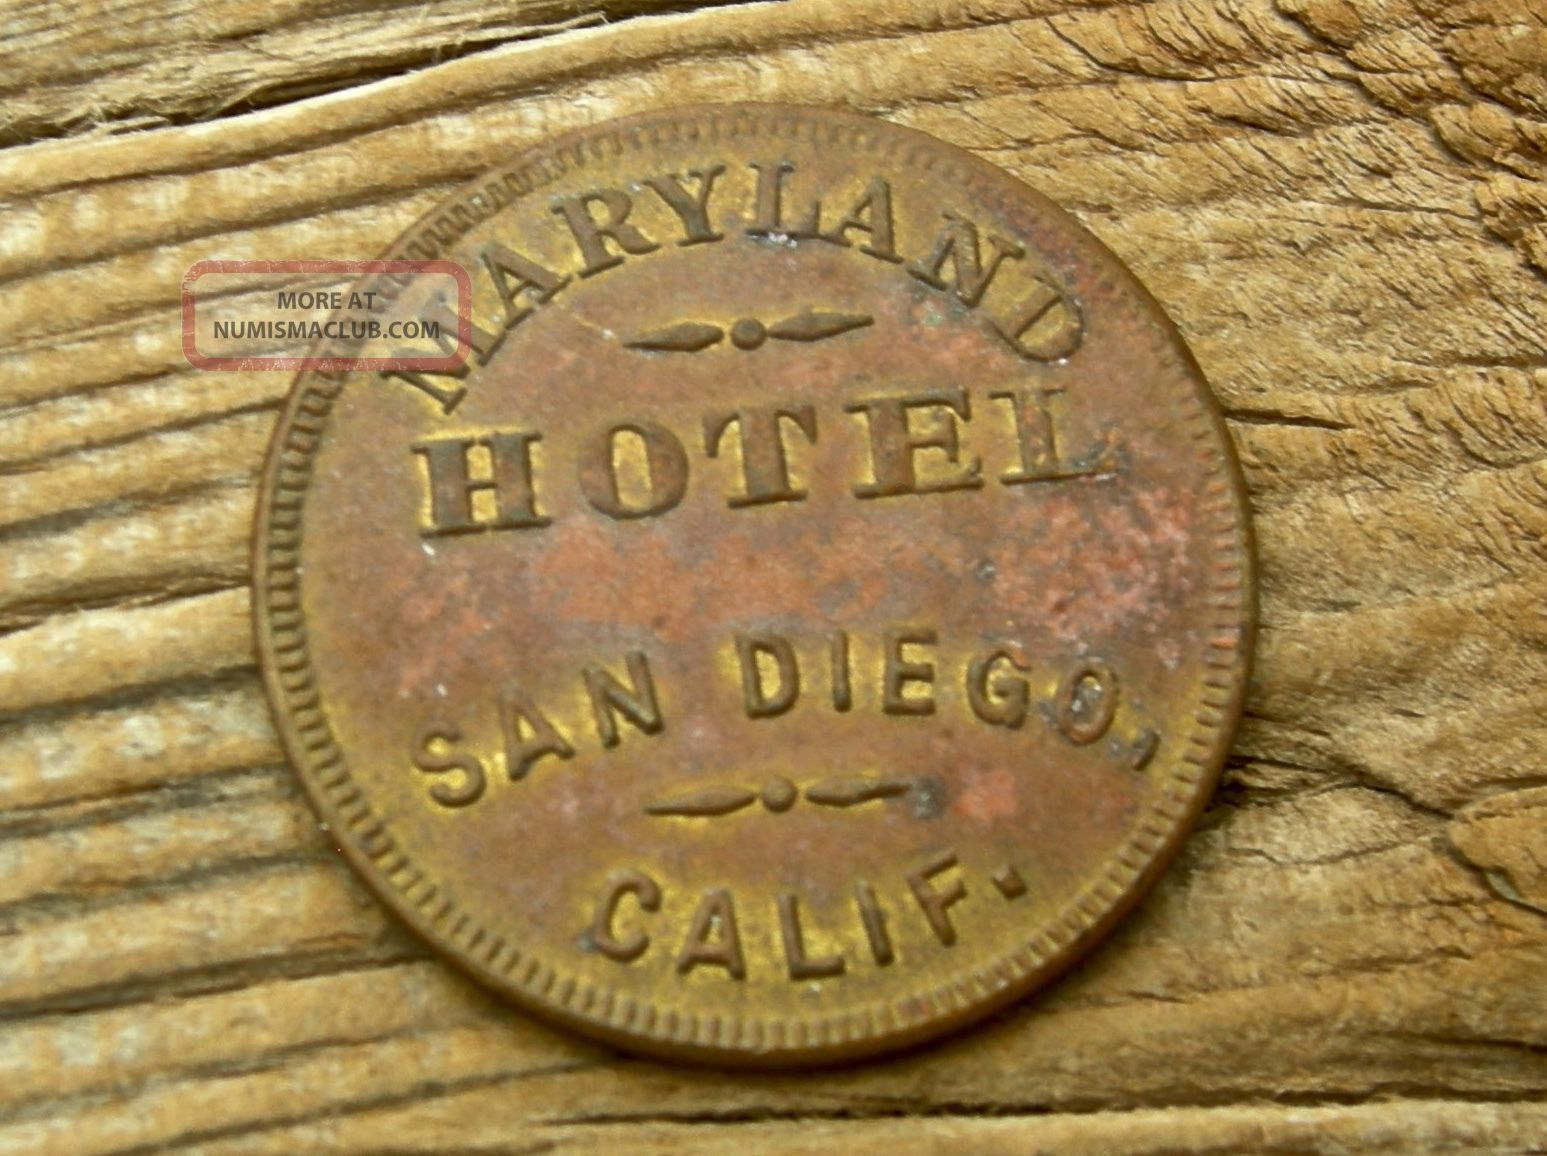 1900 San Diego California Ca R10